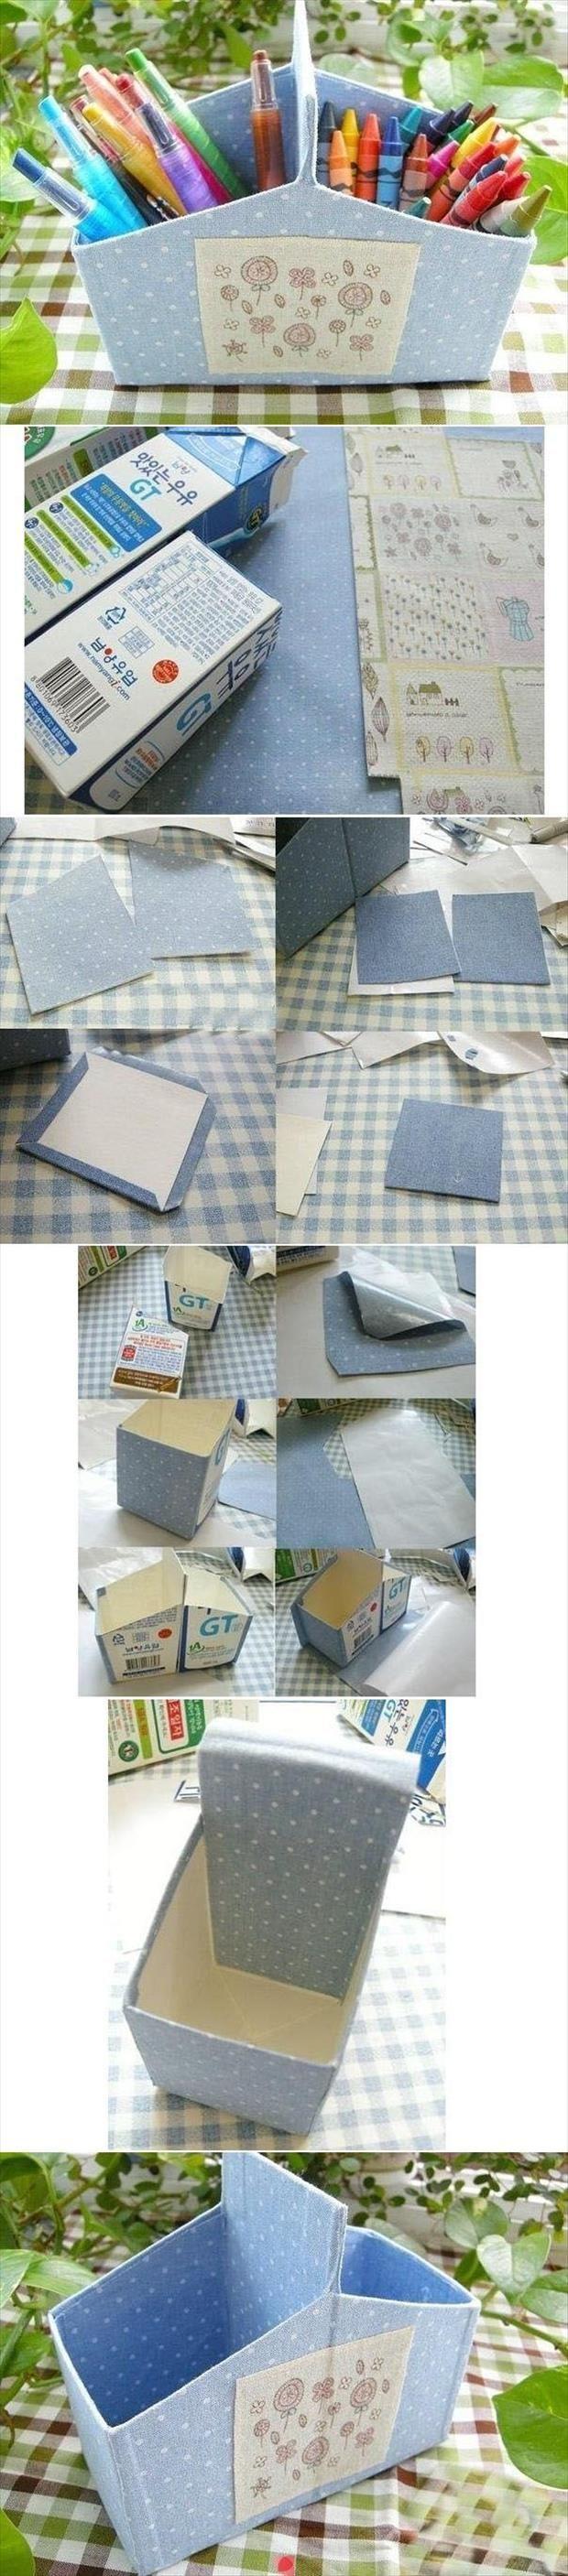 best diy u crafts idea images on pinterest craft ideas